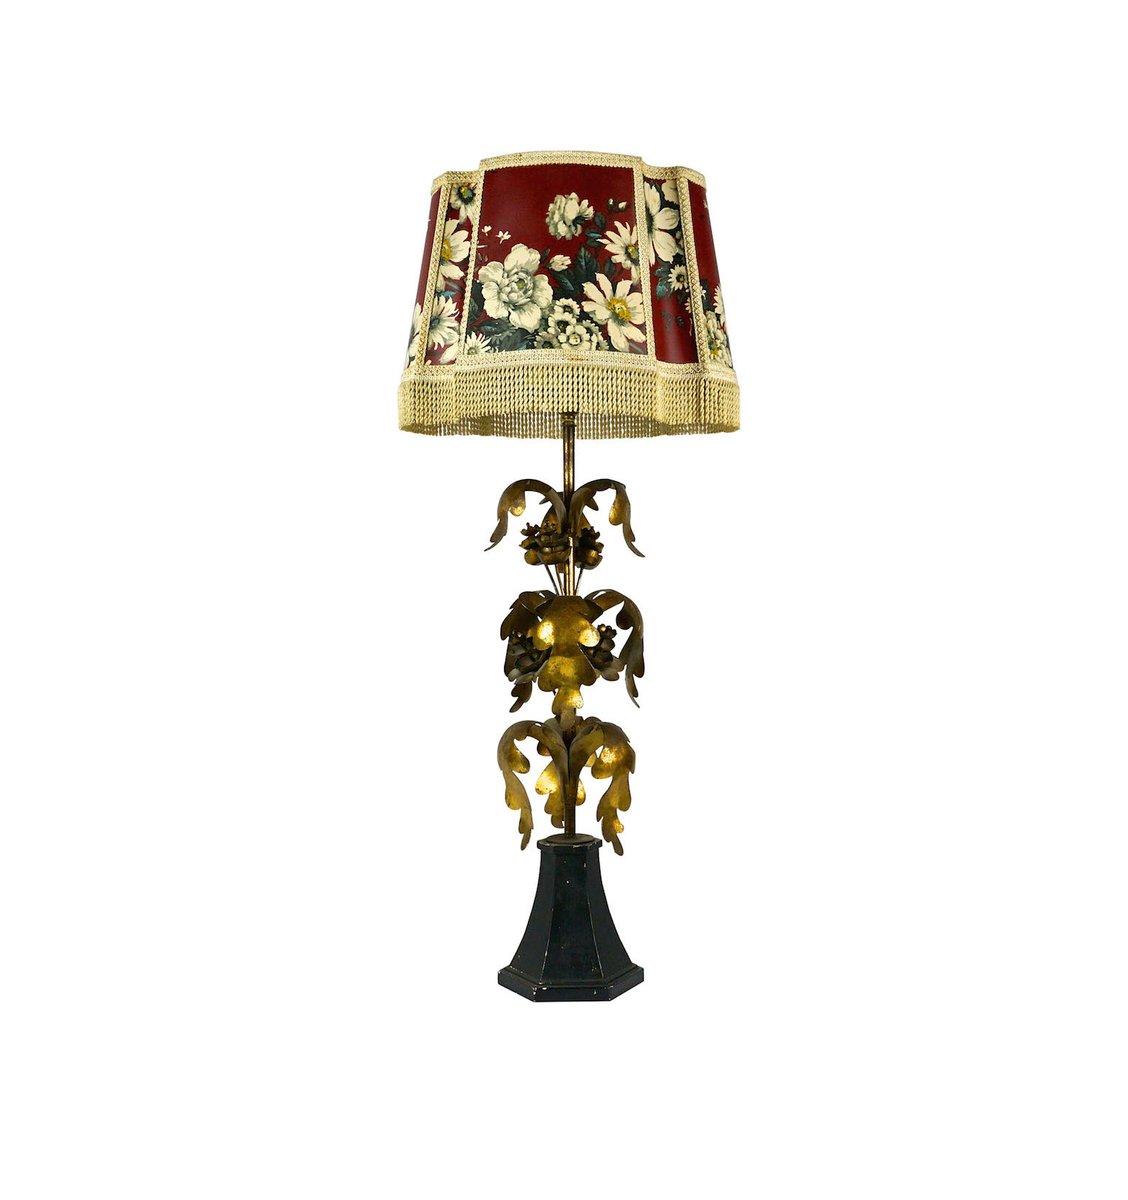 Lampe de bureau hollywood regency vintage dor e en vente - Lampe de bureau style anglais ...